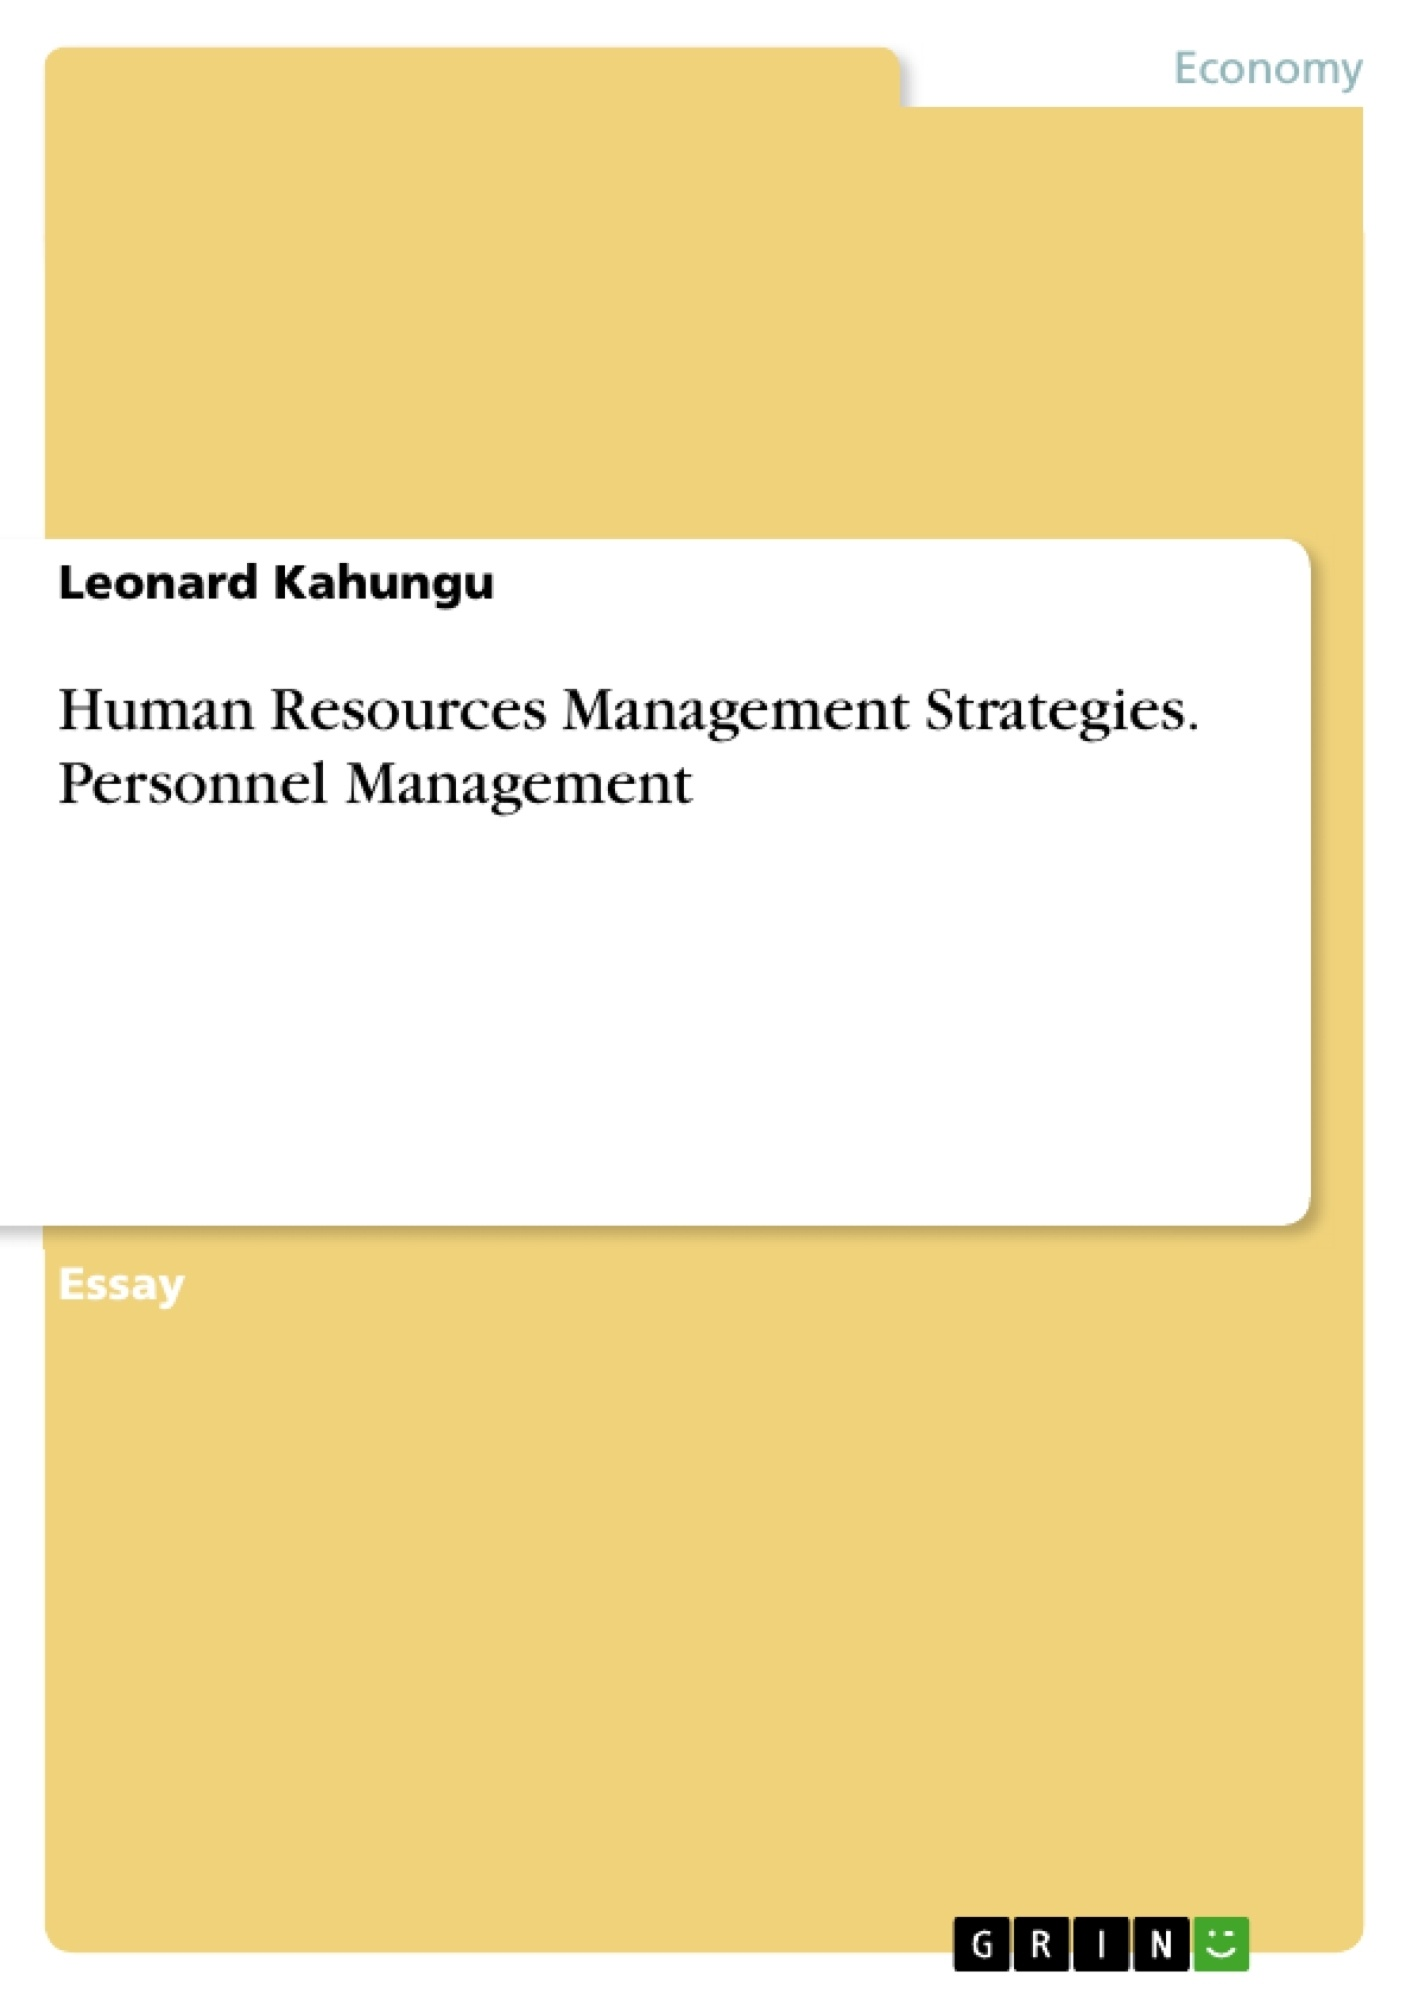 Title: Human Resources Management Strategies. Personnel Management